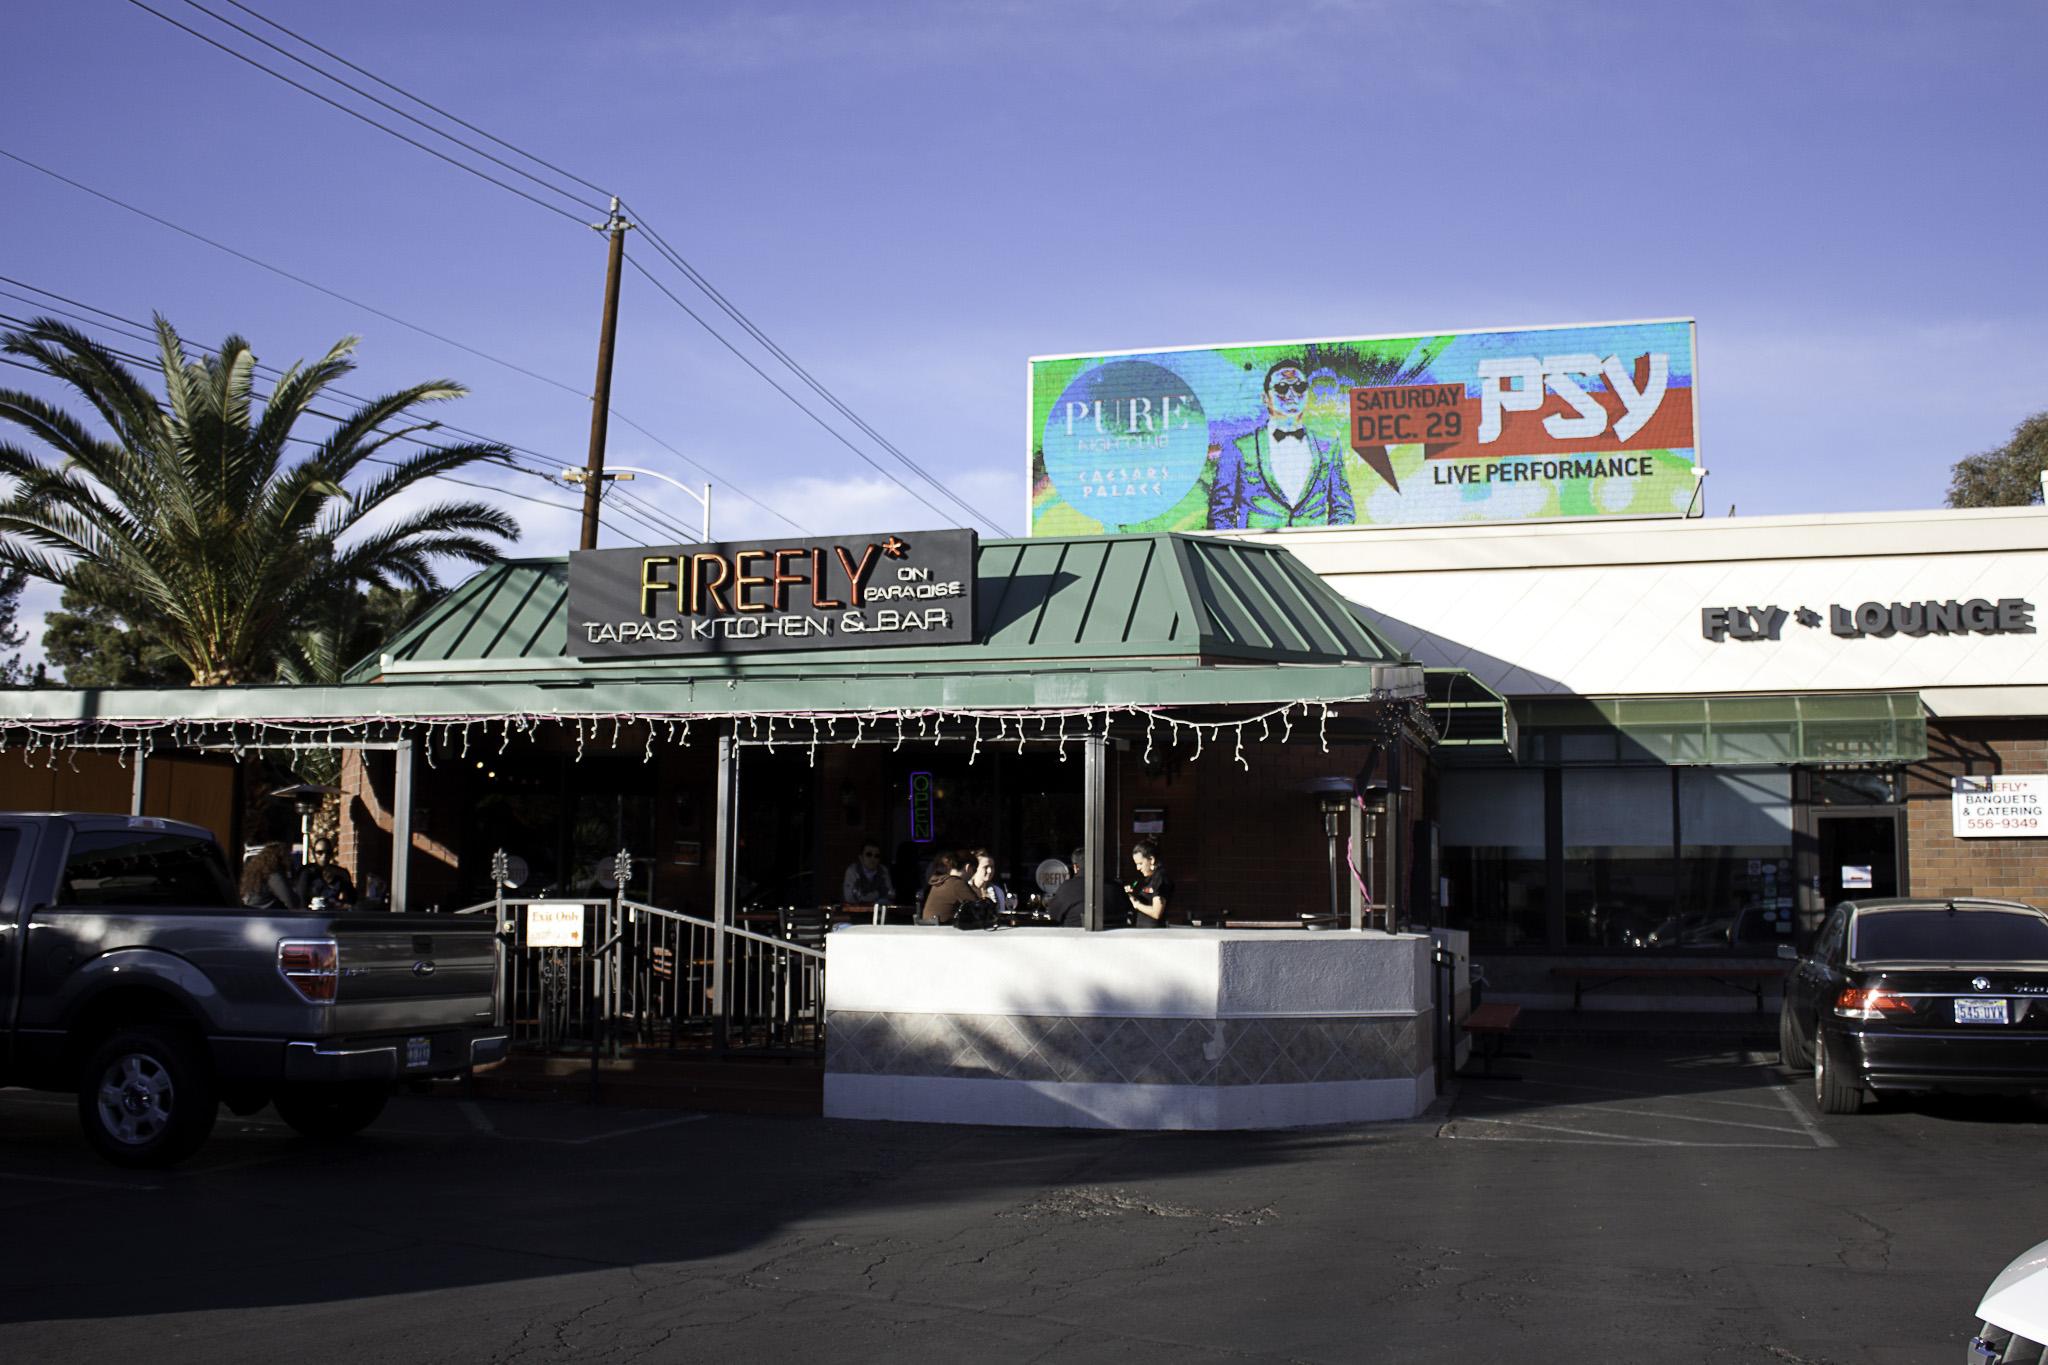 The original Firefly Tapas Kitchen & Bar on Paradise Road